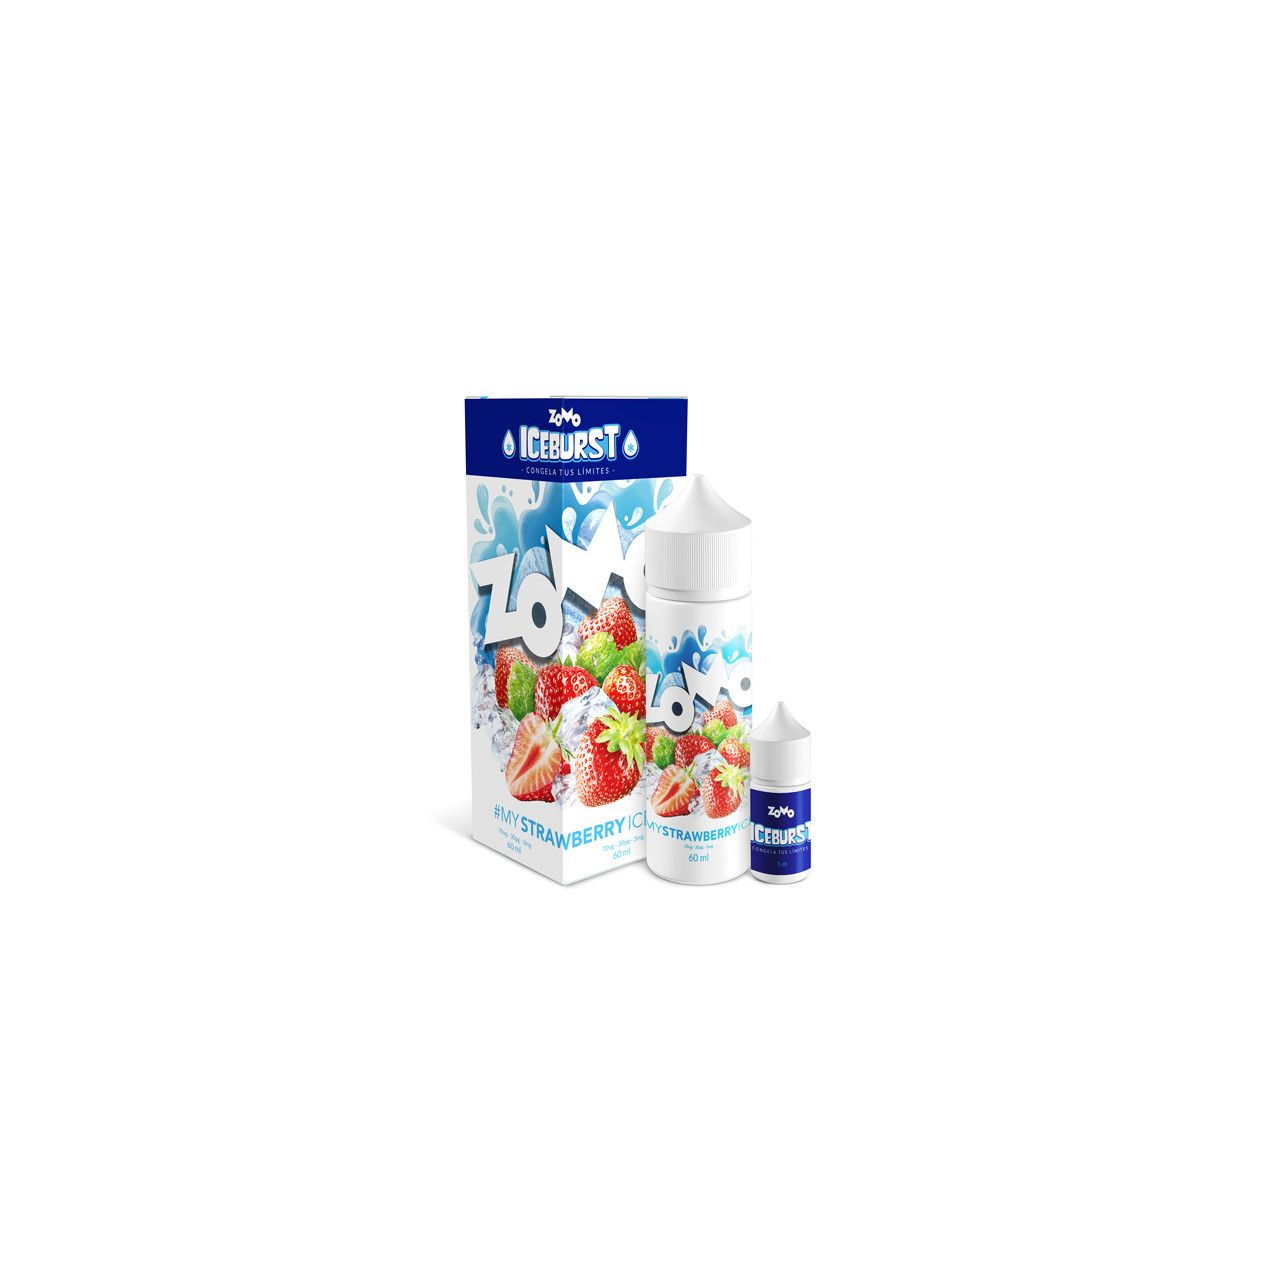 Líquido (Juice) - Strawberry - Ice burst - Zomo Vape